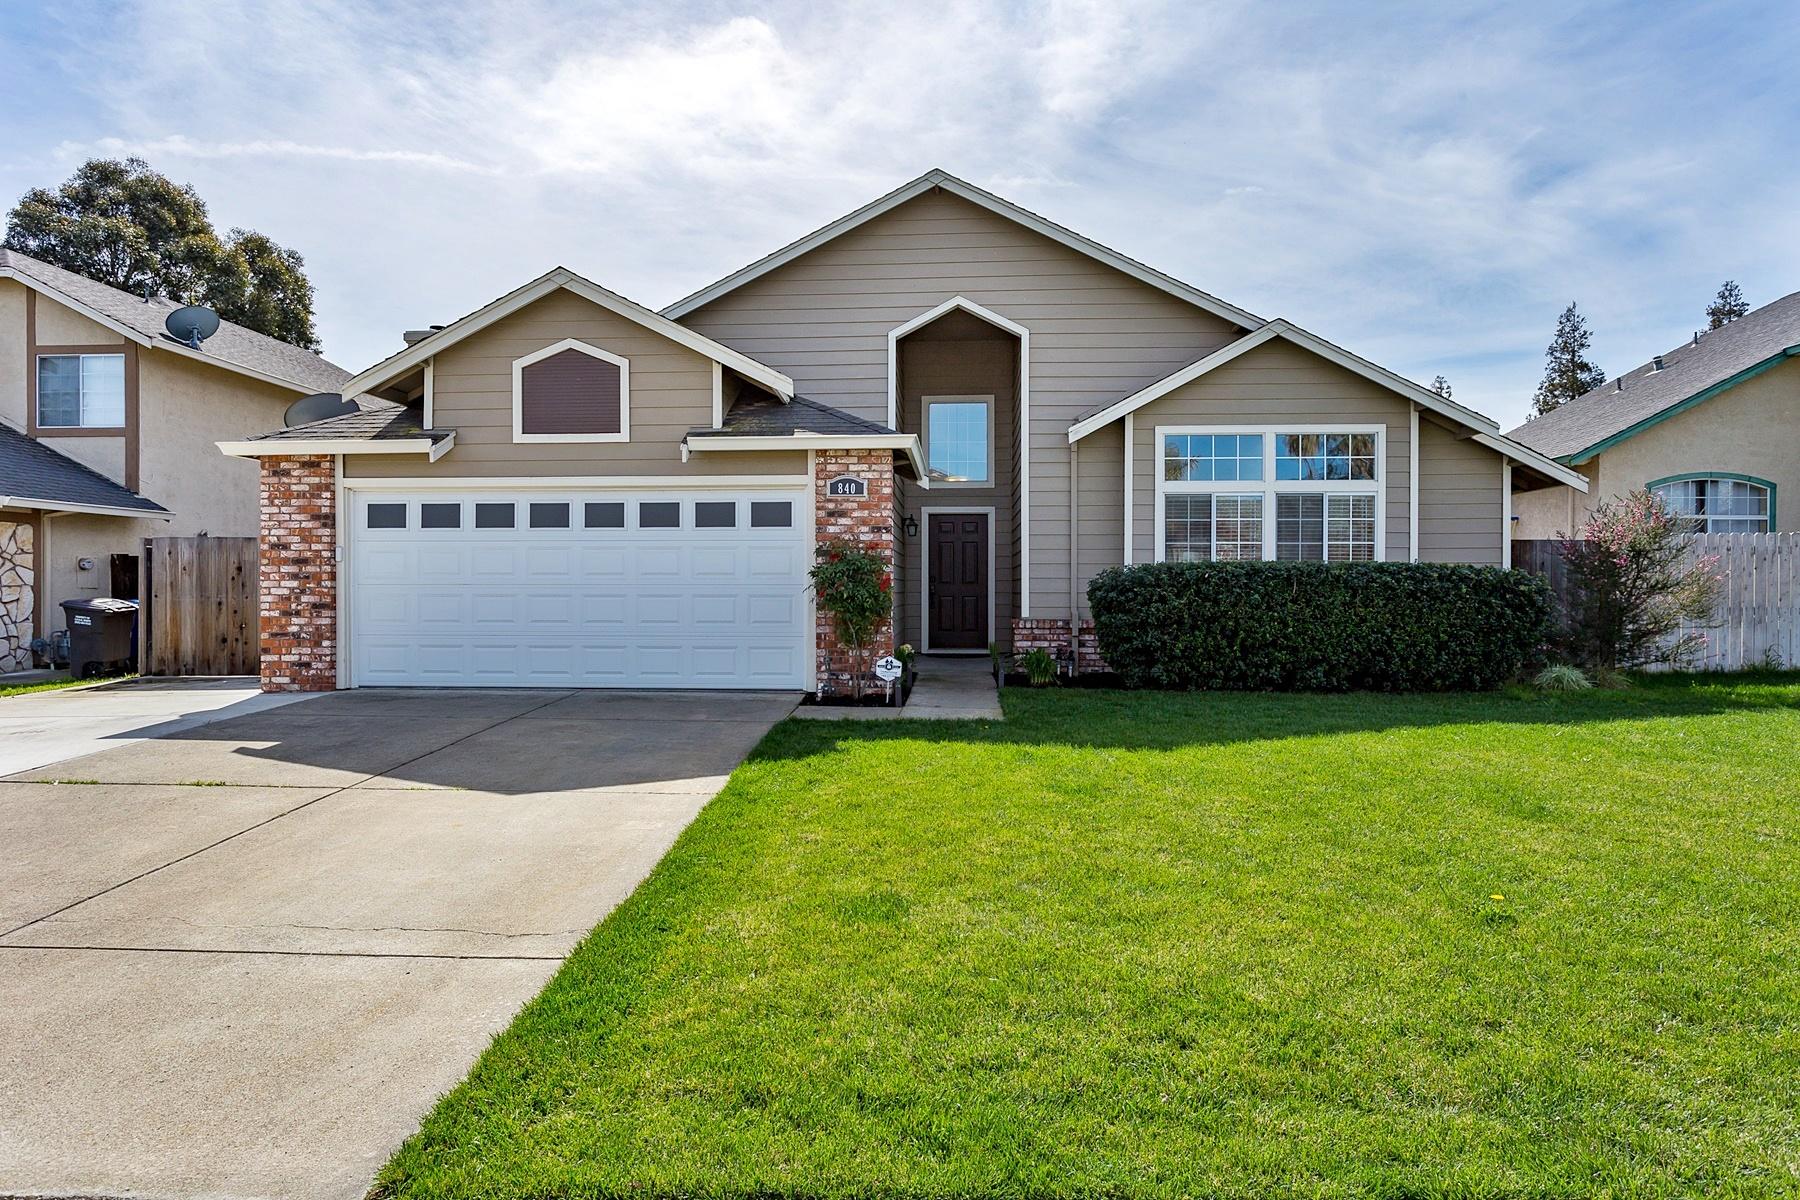 独户住宅 为 销售 在 Great Value In Oakley 840 Souverain Court Oakley, 加利福尼亚州 94561 美国